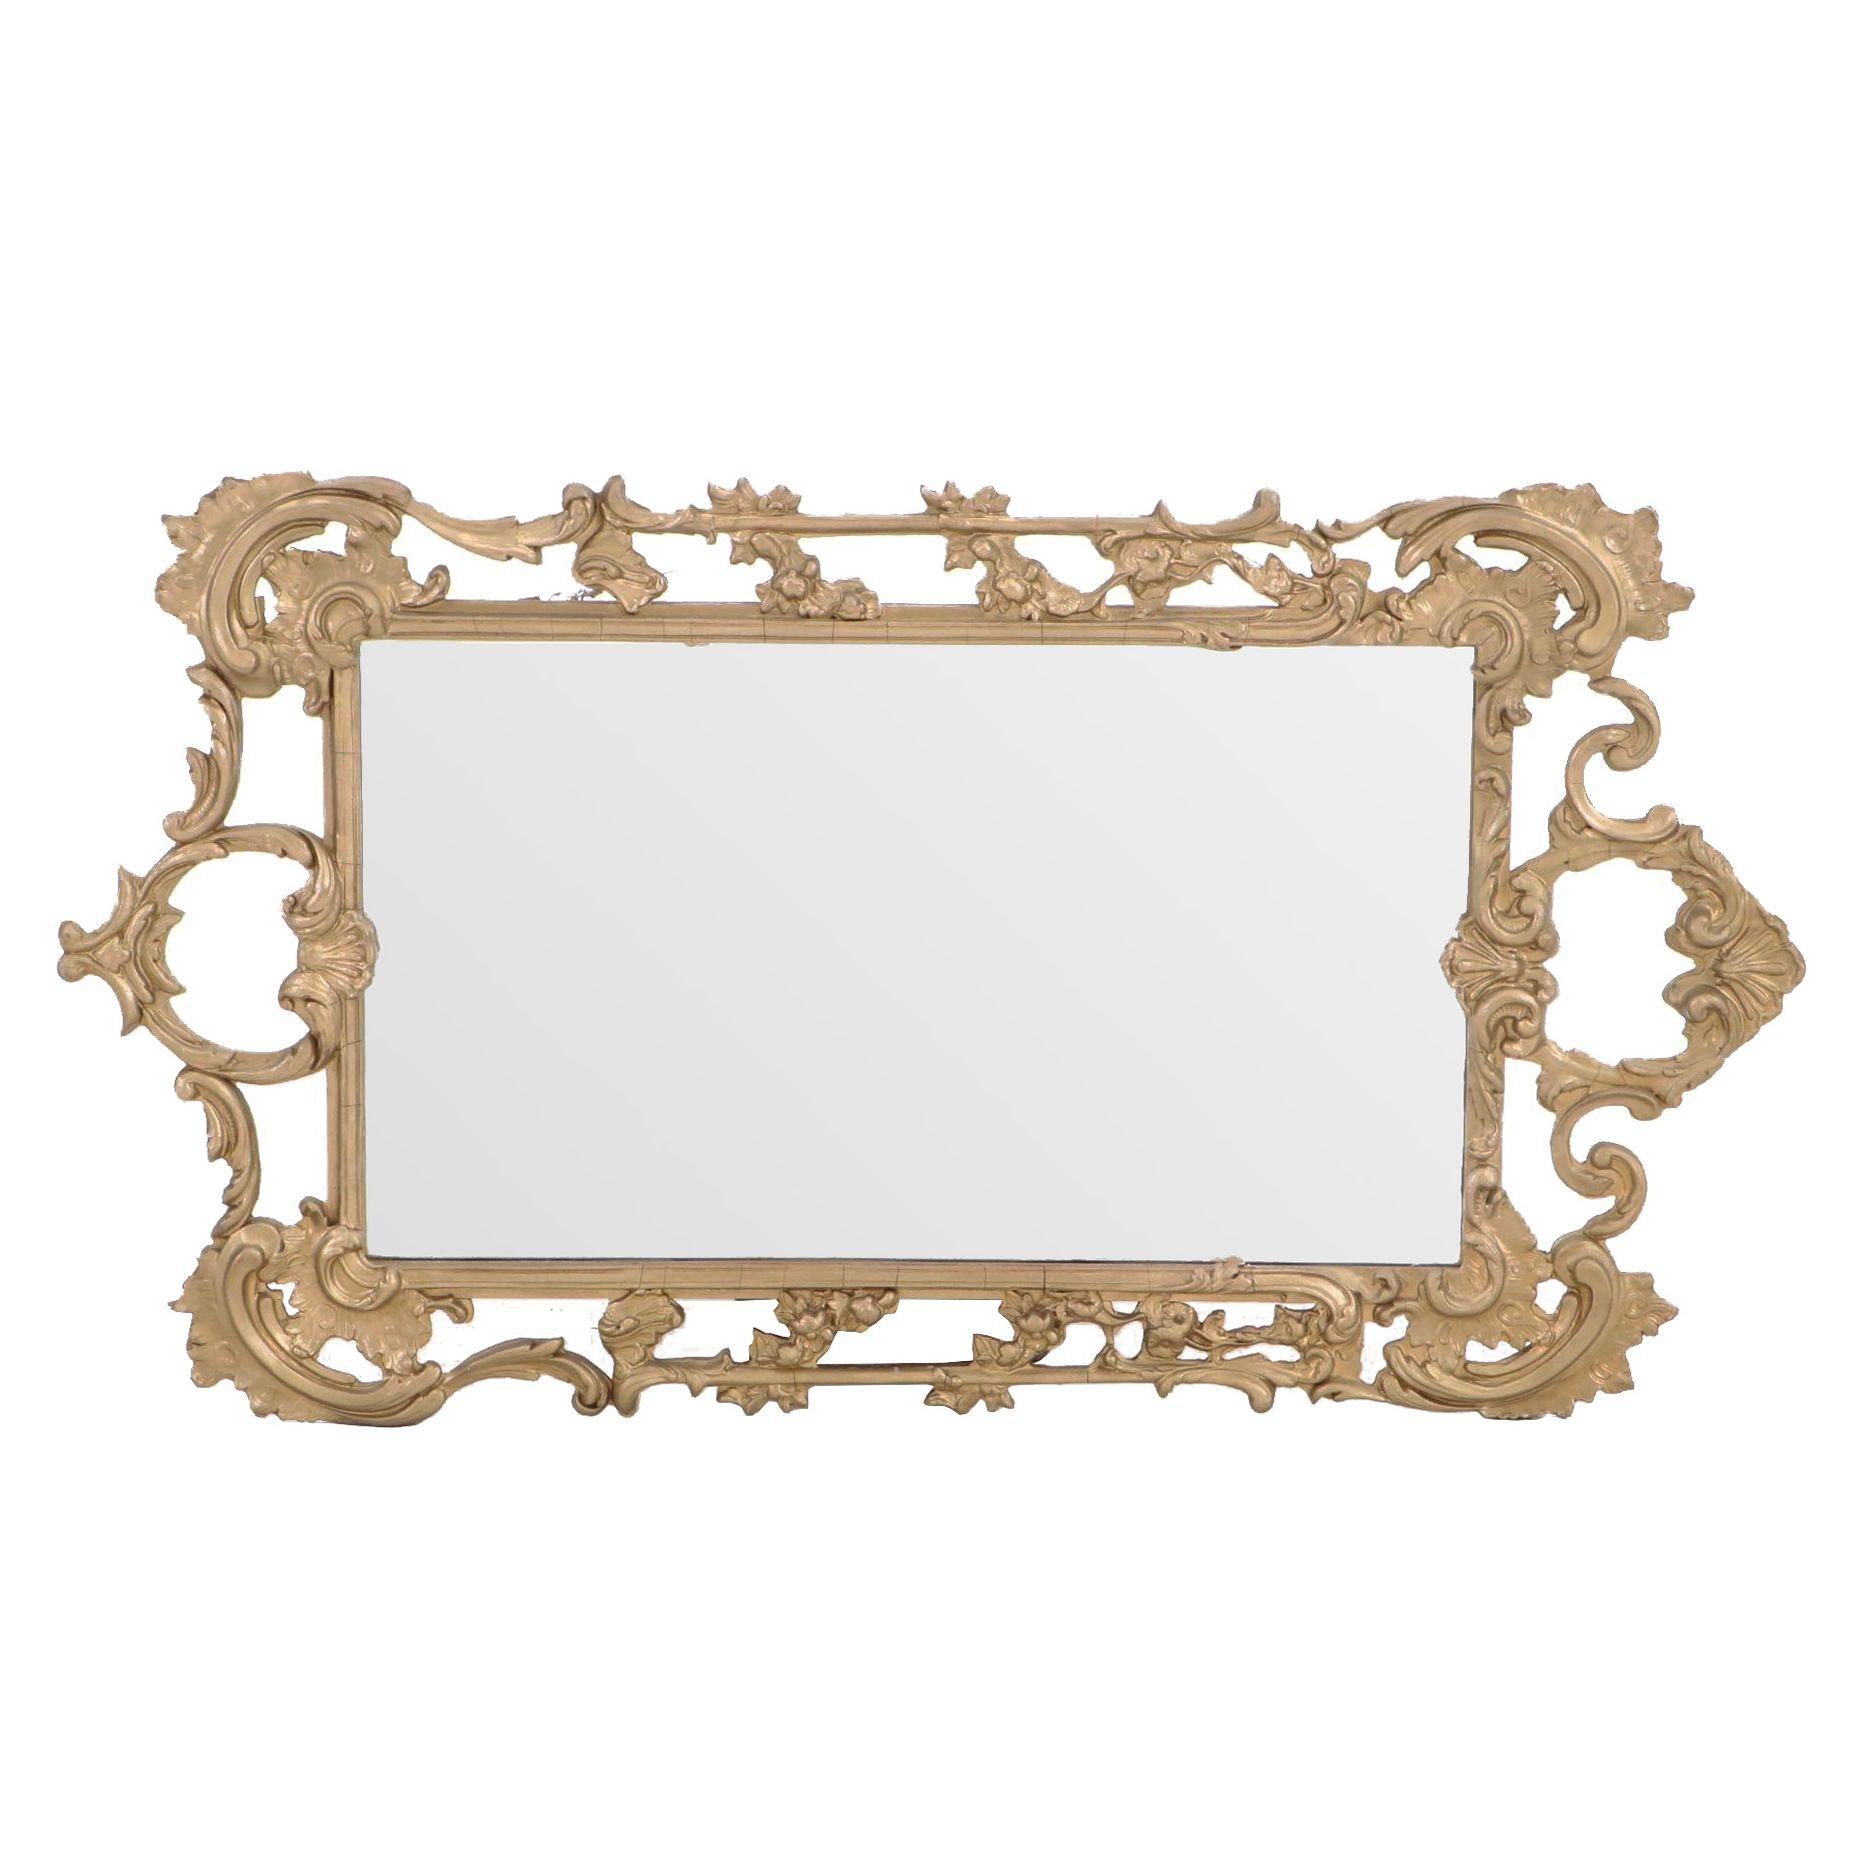 Peerart Gilt Rococo Style Mirror